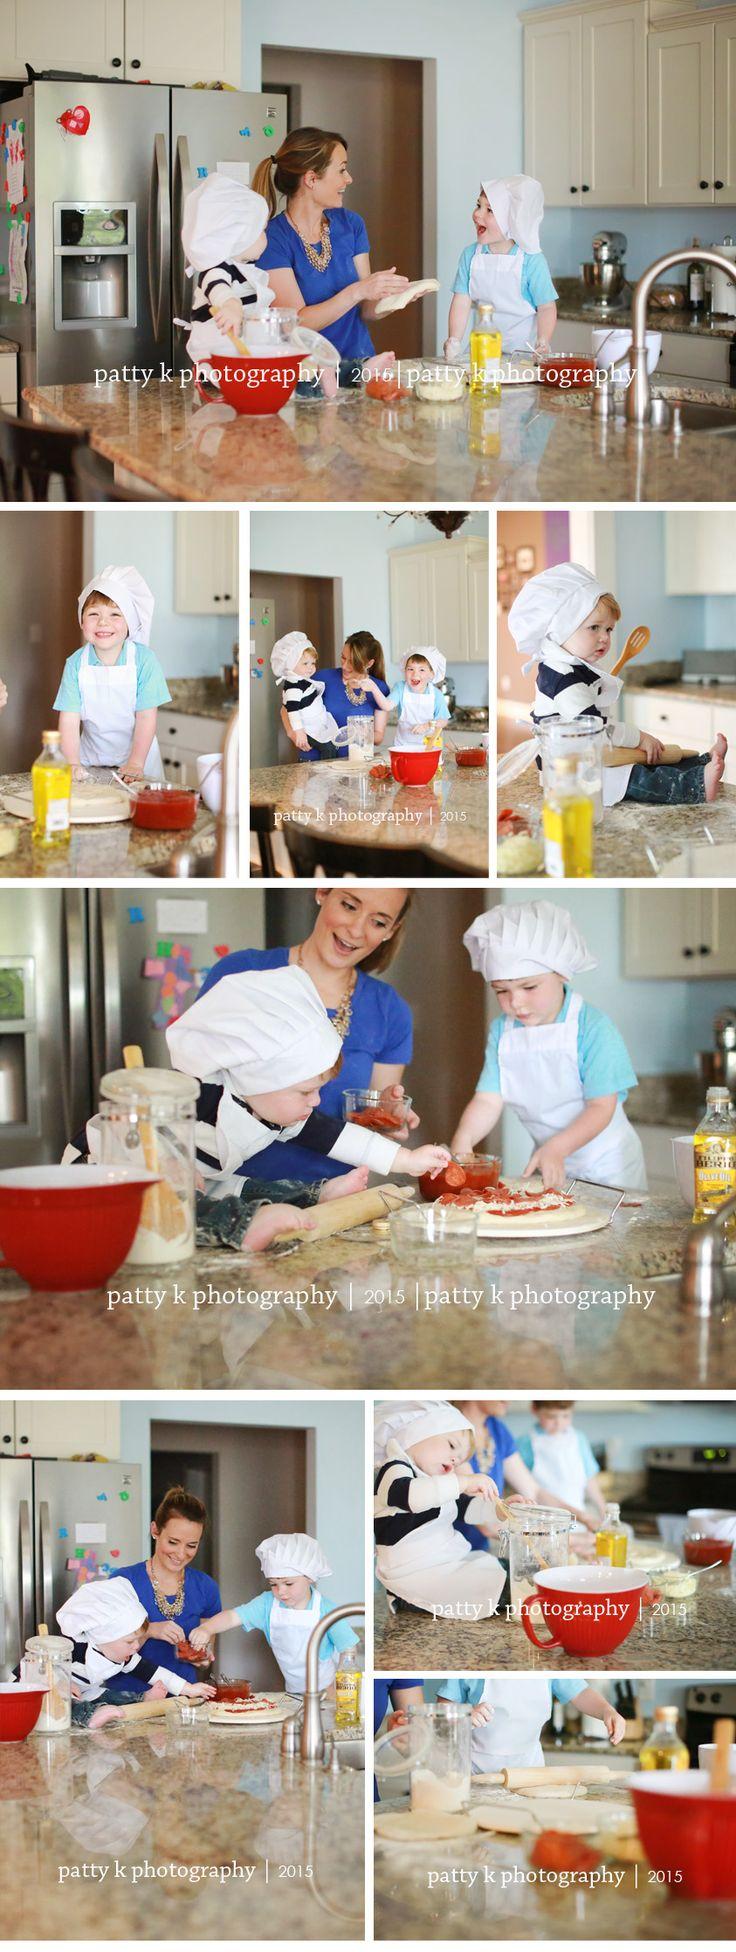 Mom & her Boys | Lifestyle Imagination Session | Fayetteville, NC Child Photographer | Patty K Photography